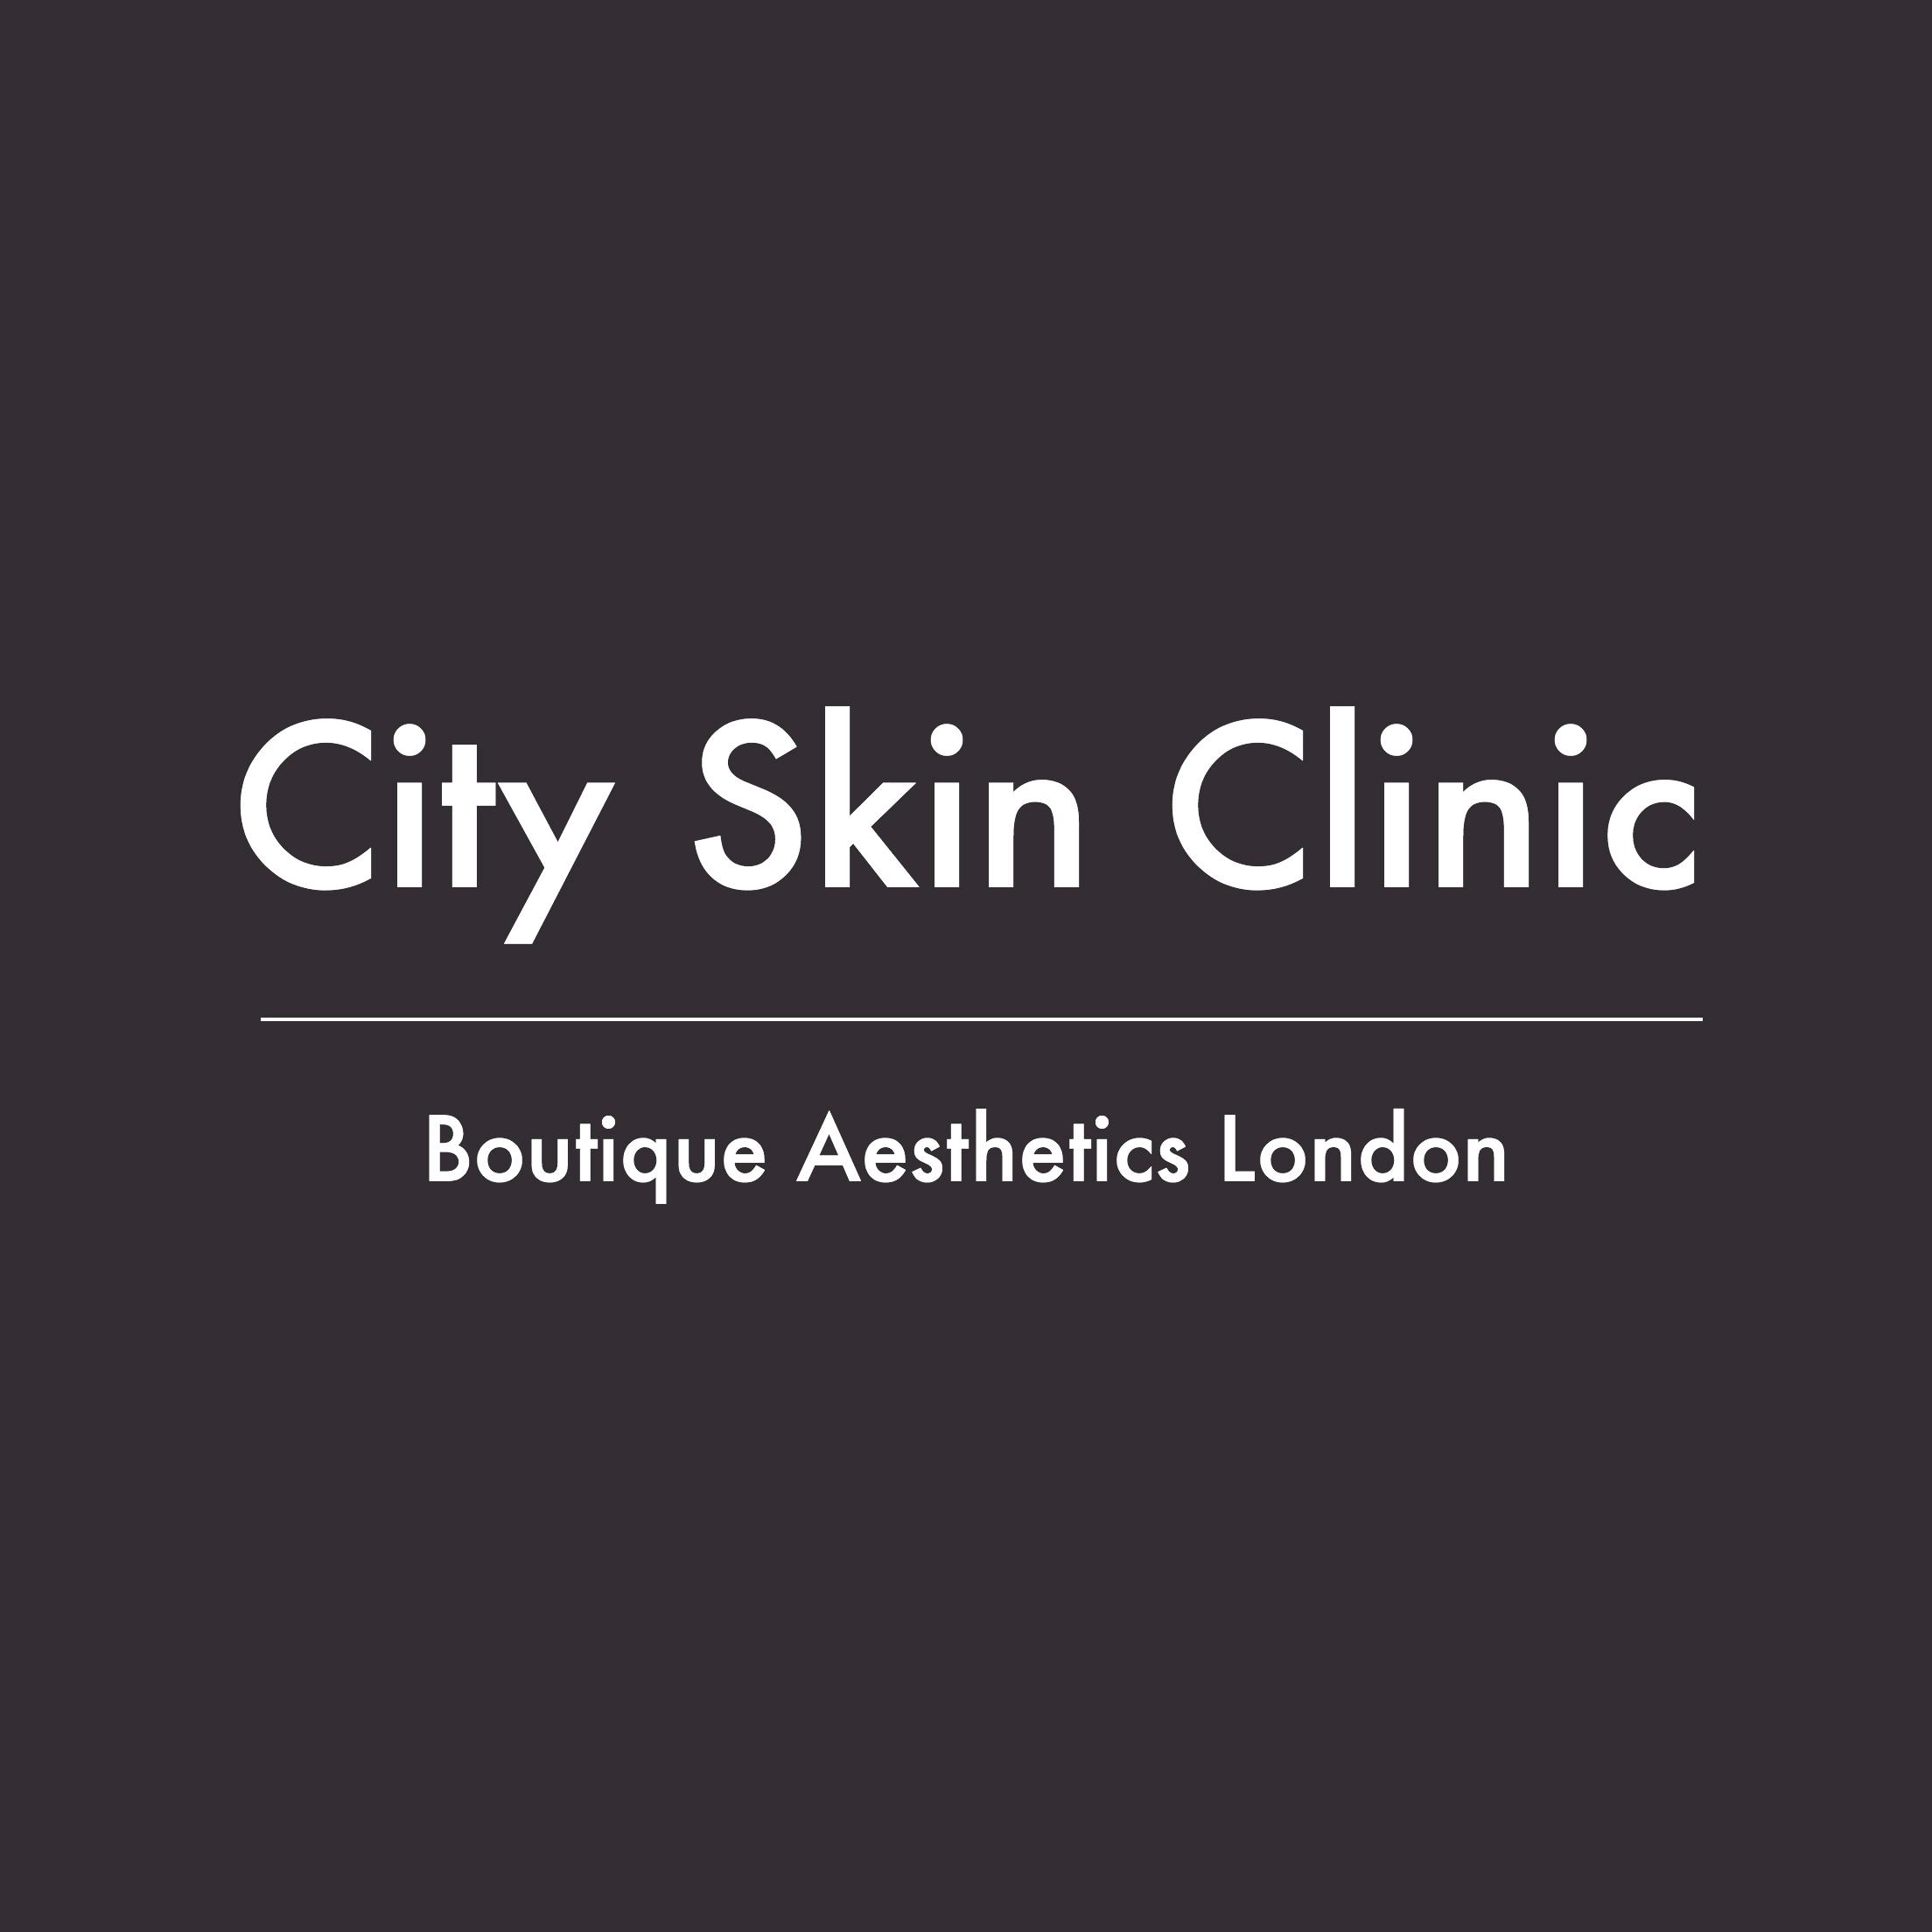 City Skin Clinic